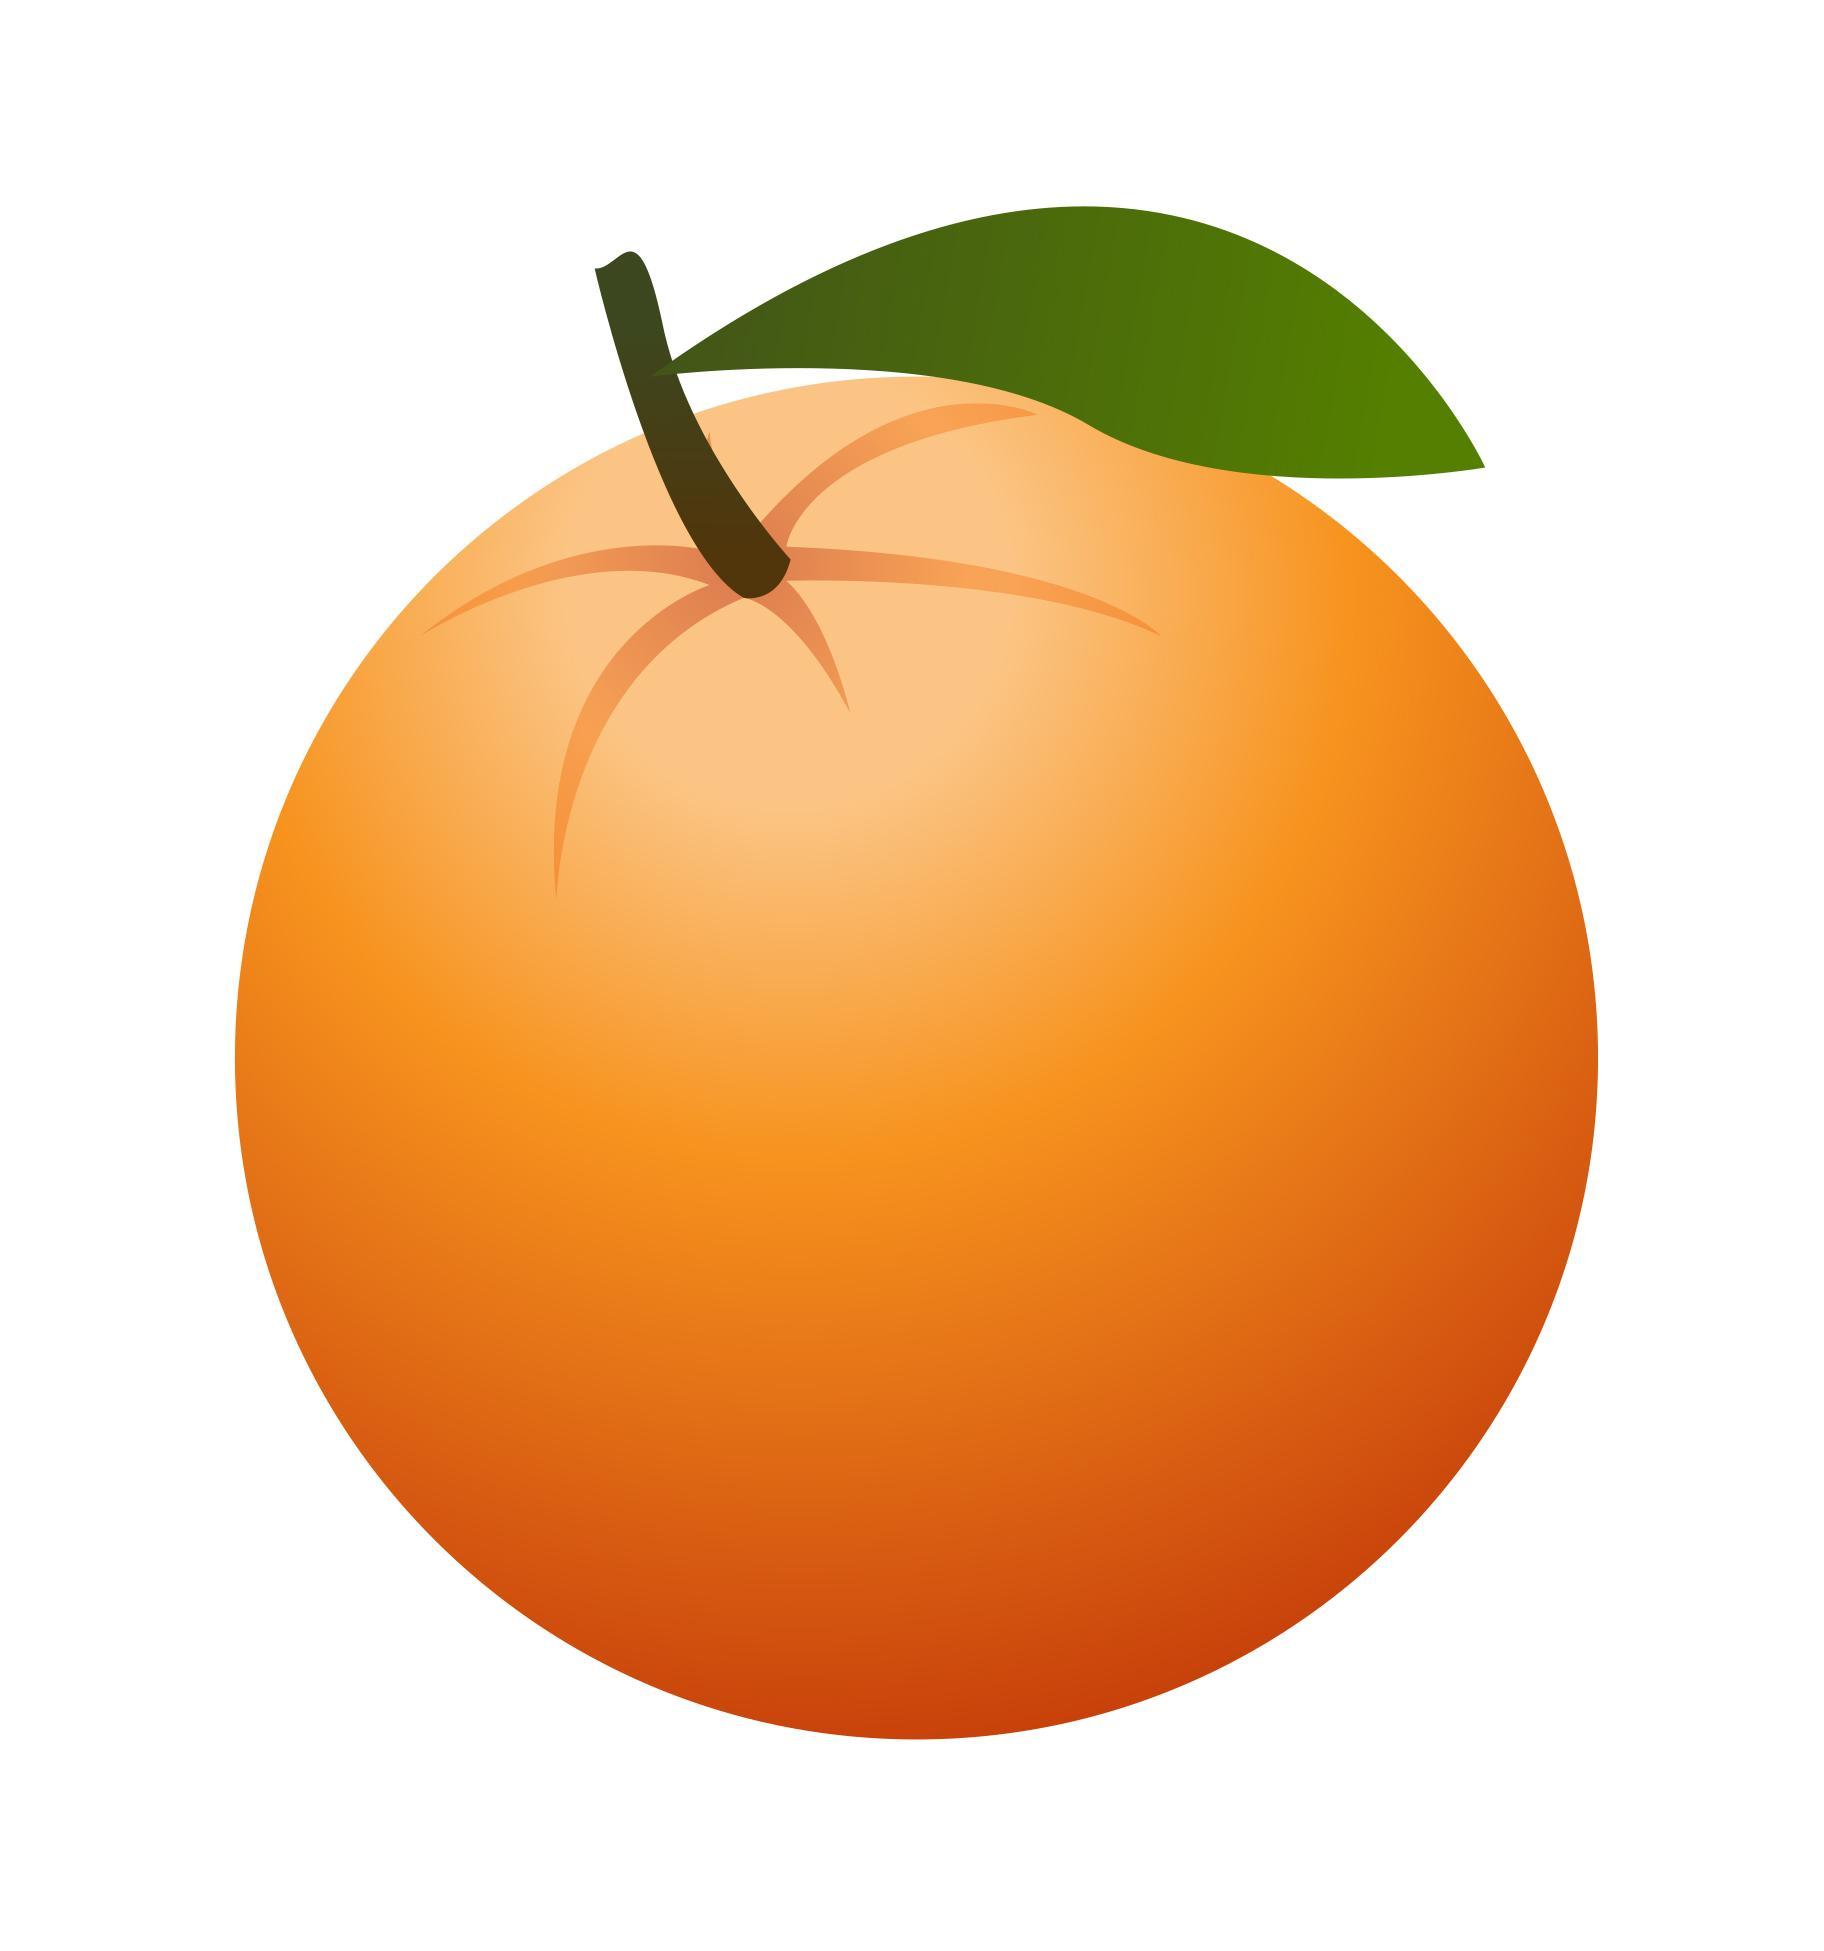 Orange Fruit Drawing at GetDrawings.com | Free for personal use ... for Drawing Orange Fruit  67qdu